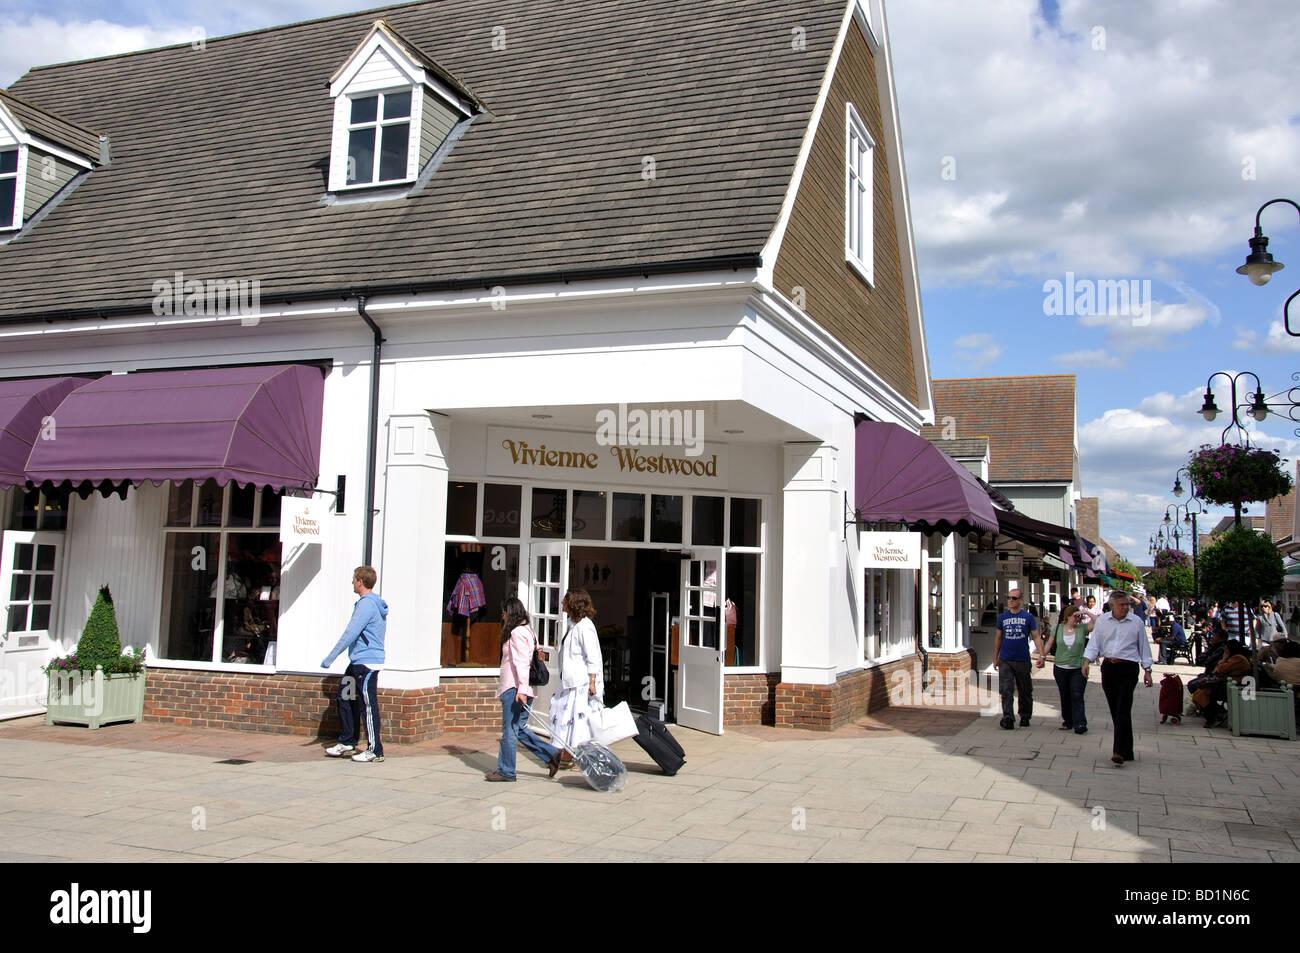 Vivienne Westwood store, Bicester Village Shopping Centre, Bicester, Oxfordshire, England, United Kingdom - Stock Image